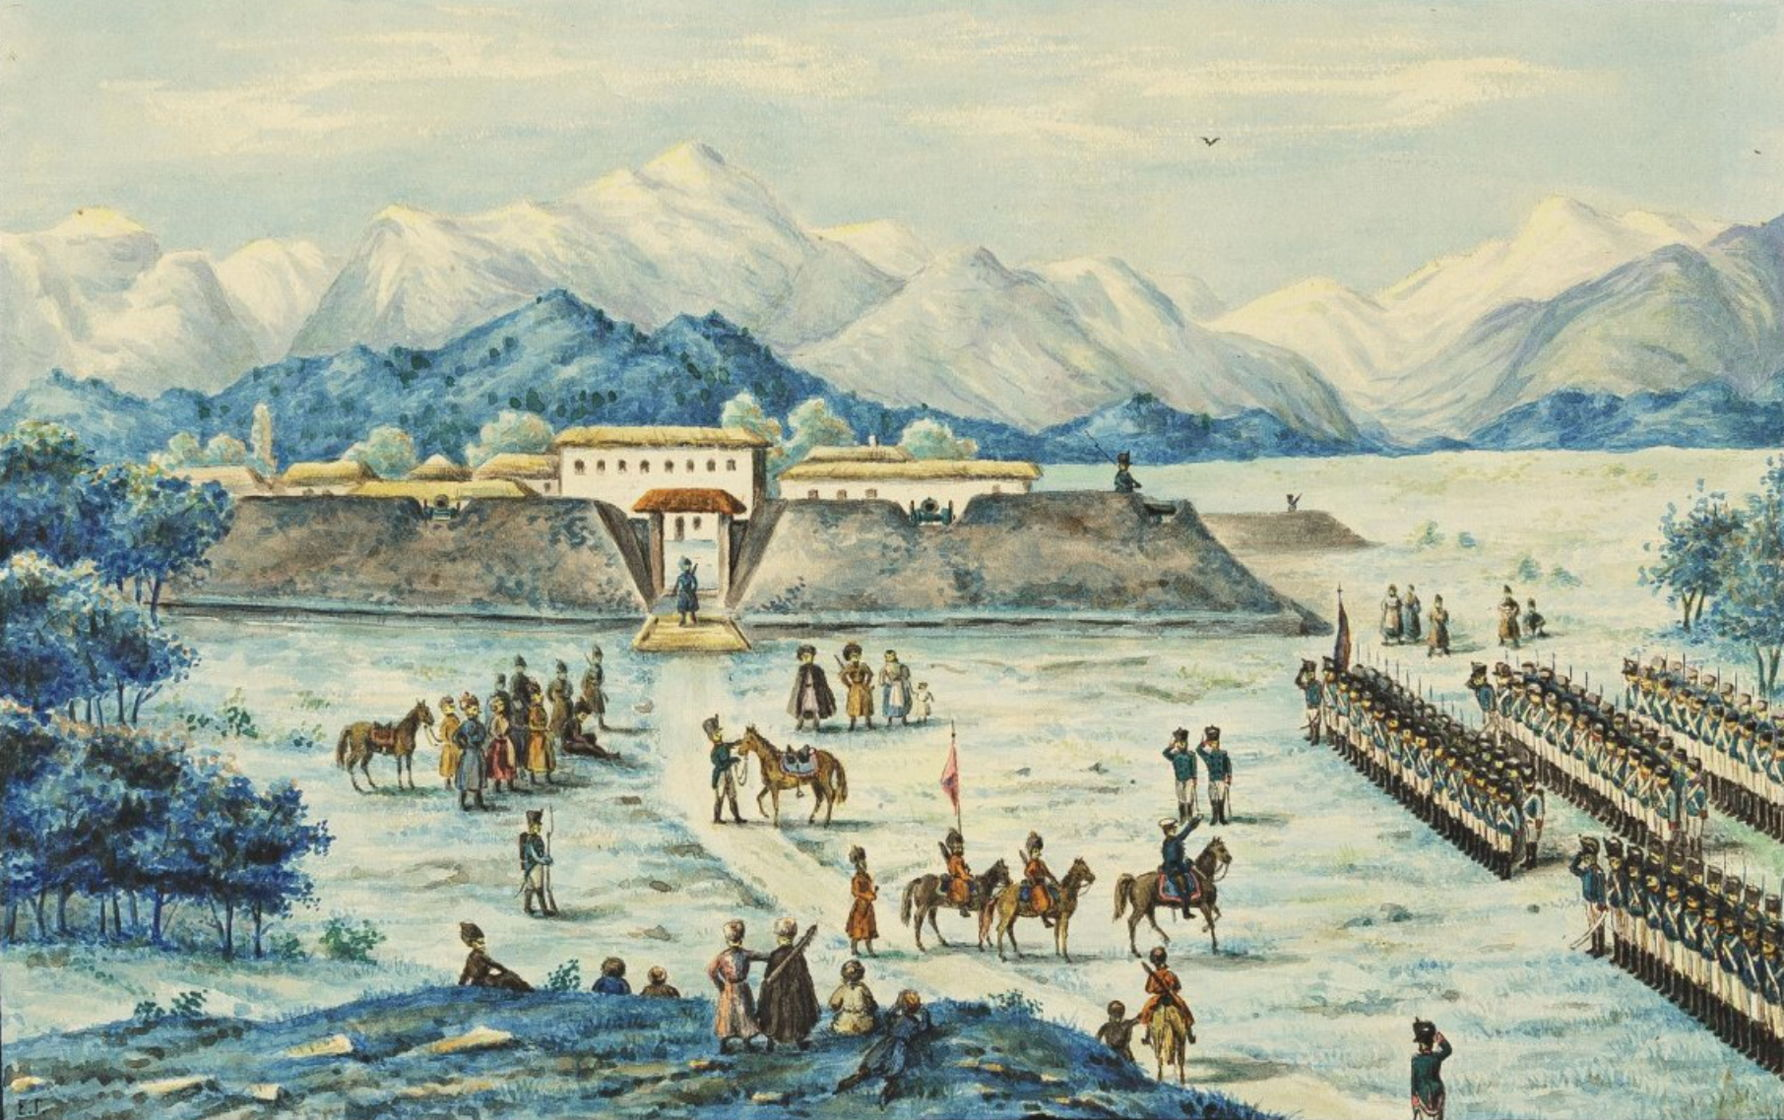 «Прибытие Тенгинского полка на Кавказ 30 августа 1819 года». На обороте - «Тенгинец 1819 года»